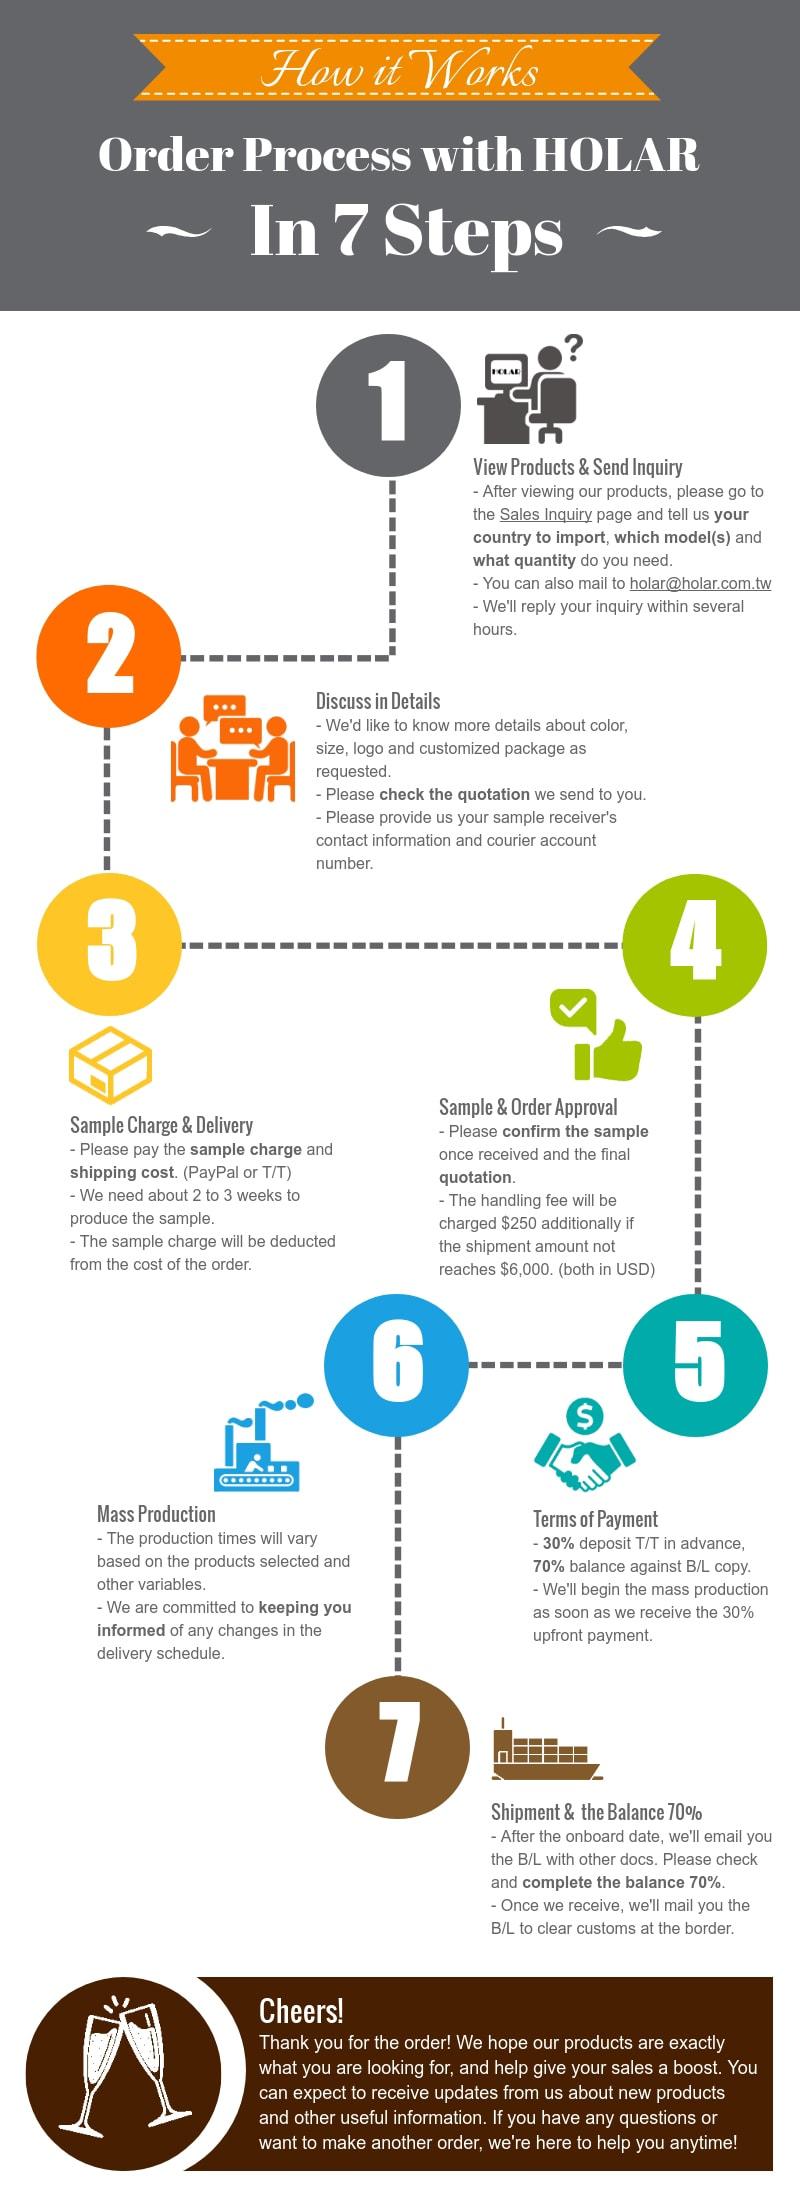 Holar 7 Steps Order Process with Holar